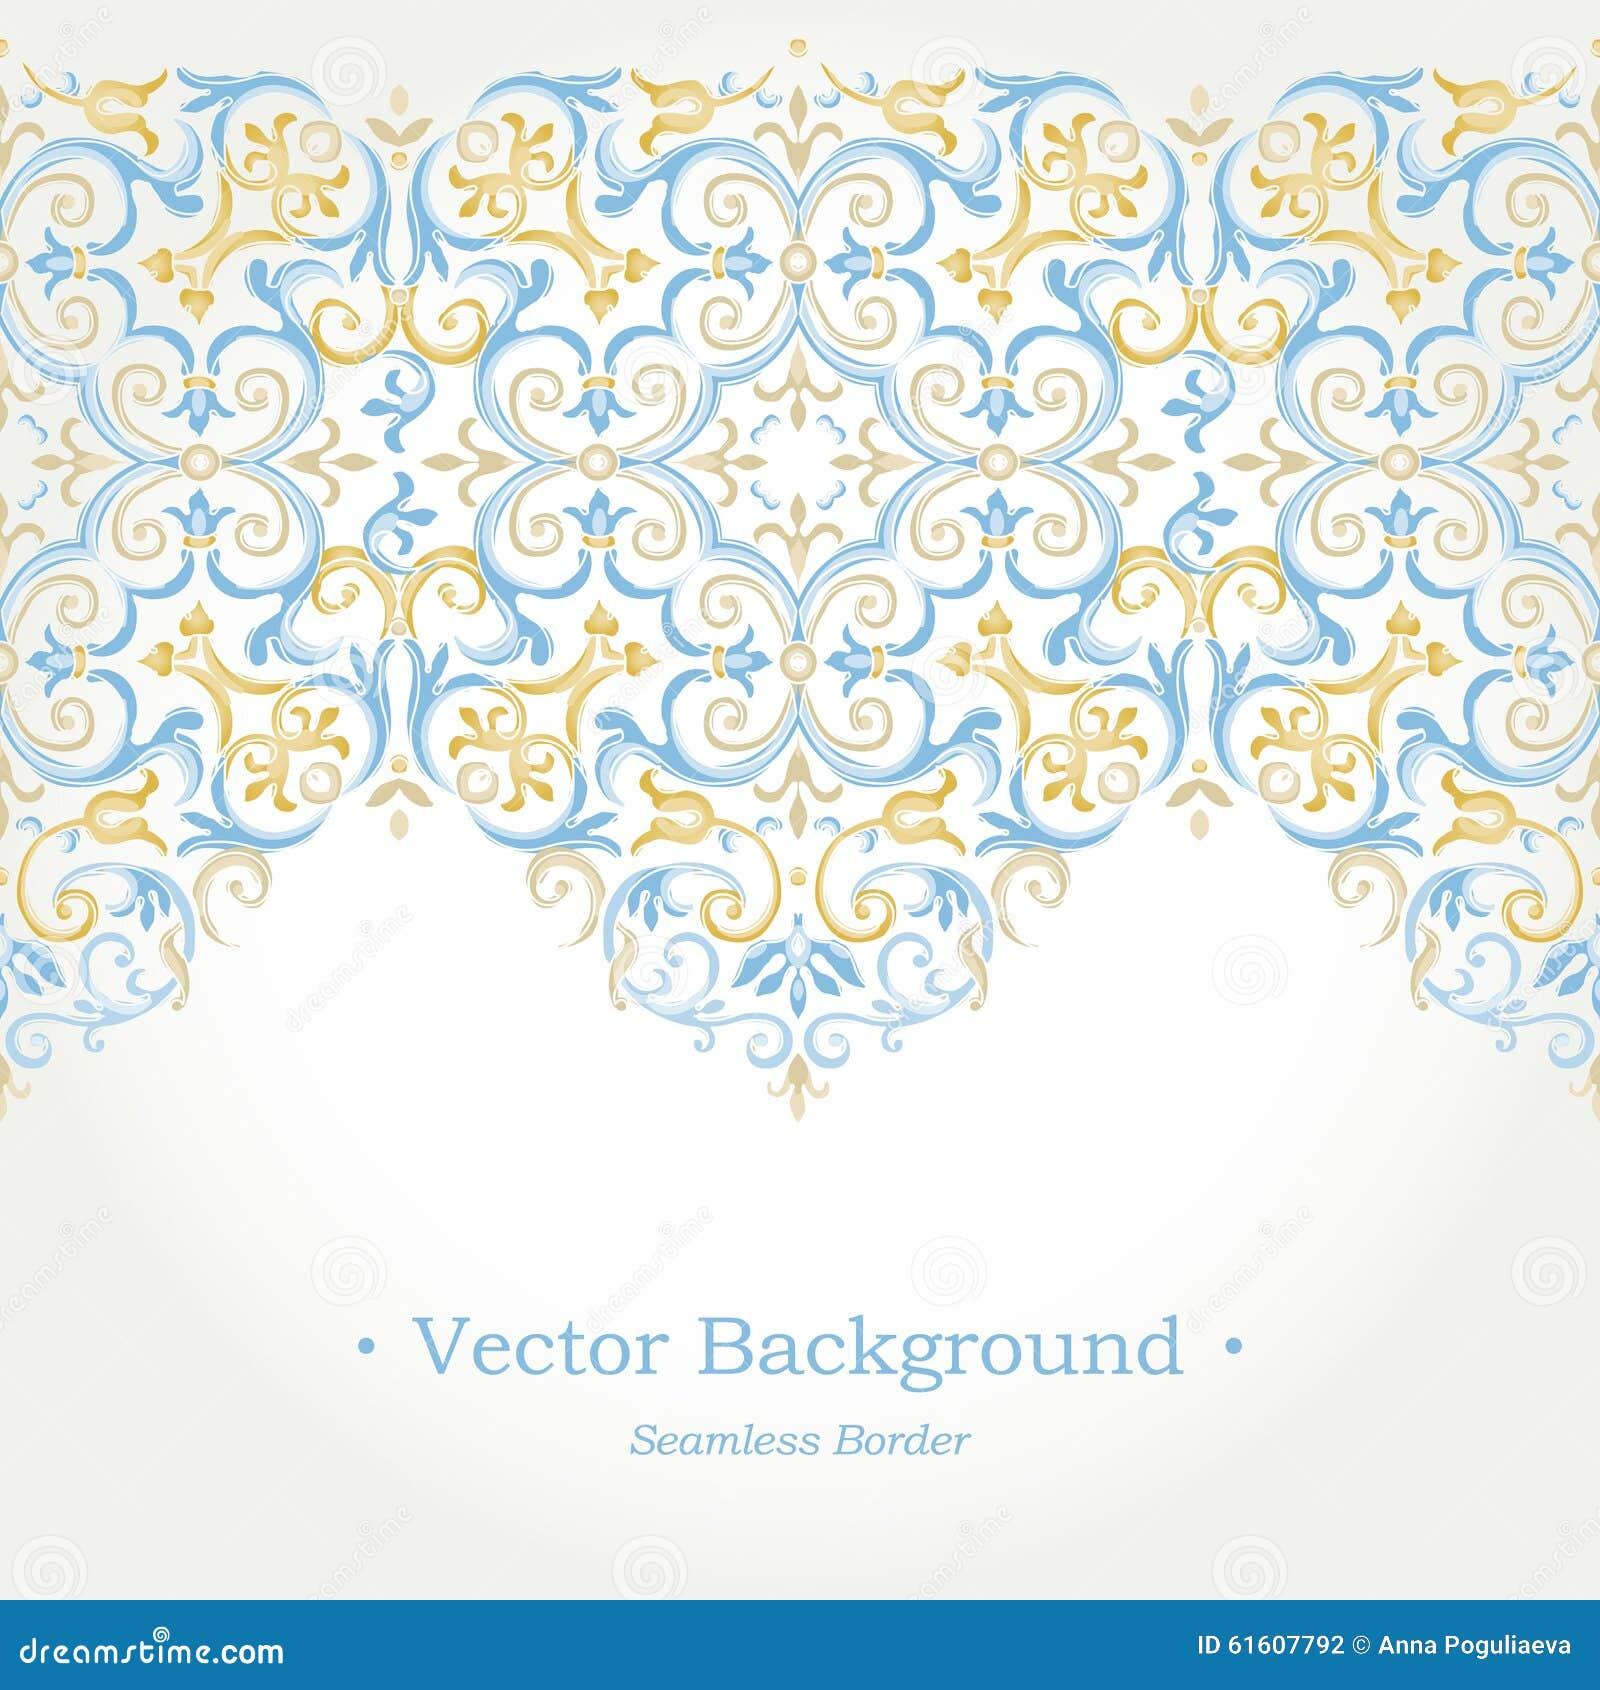 Vector Ornate Seamless Border In Eastern Style. Stock ...